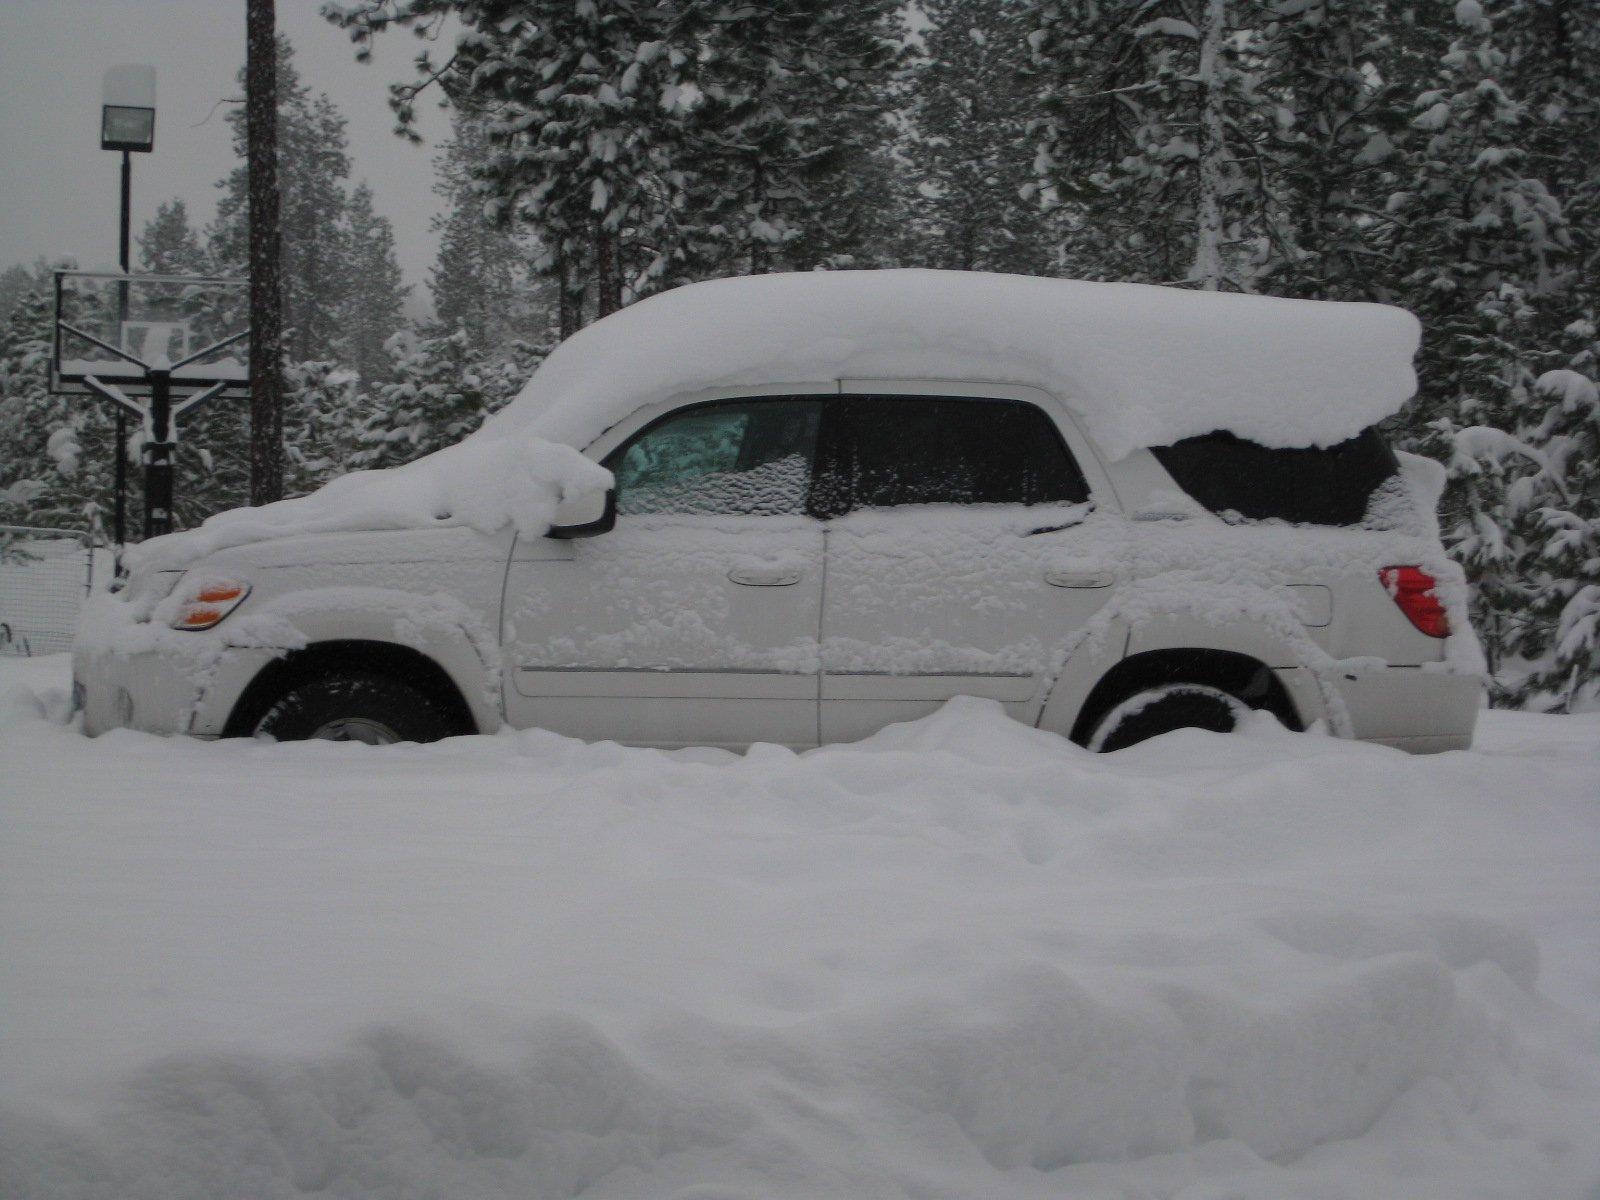 December 18th - Spokane Washington